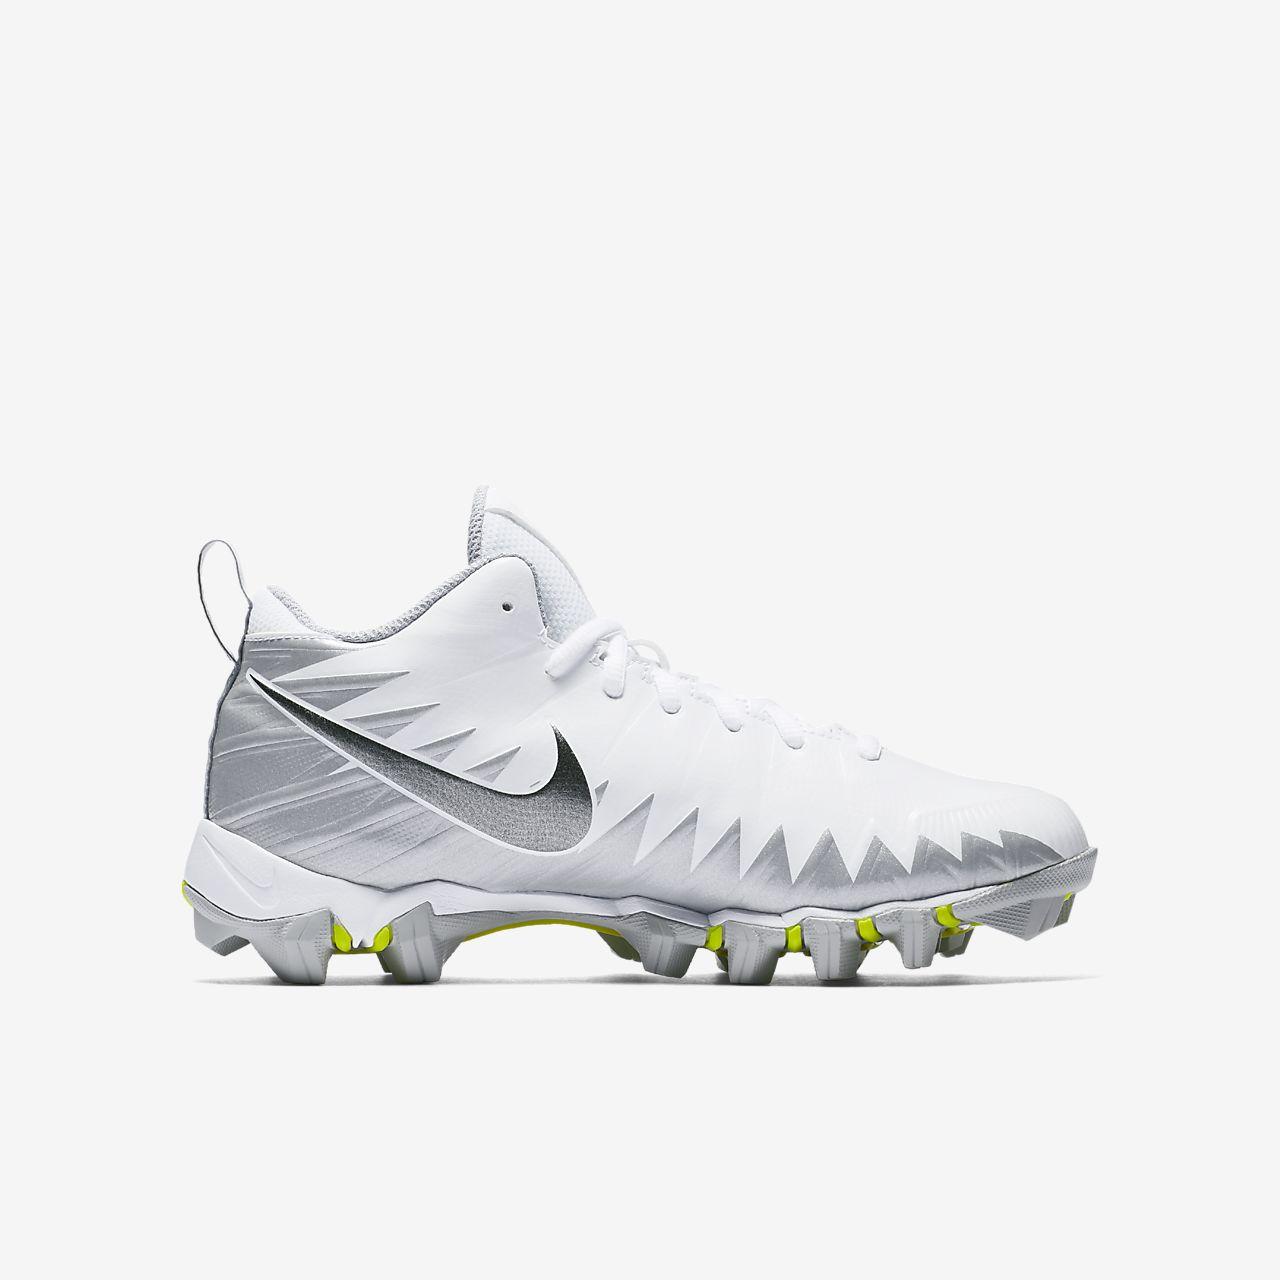 ad2e98521553 Nike Alpha Menace Shark Little/Big Kids' Football Cleat. Nike.com